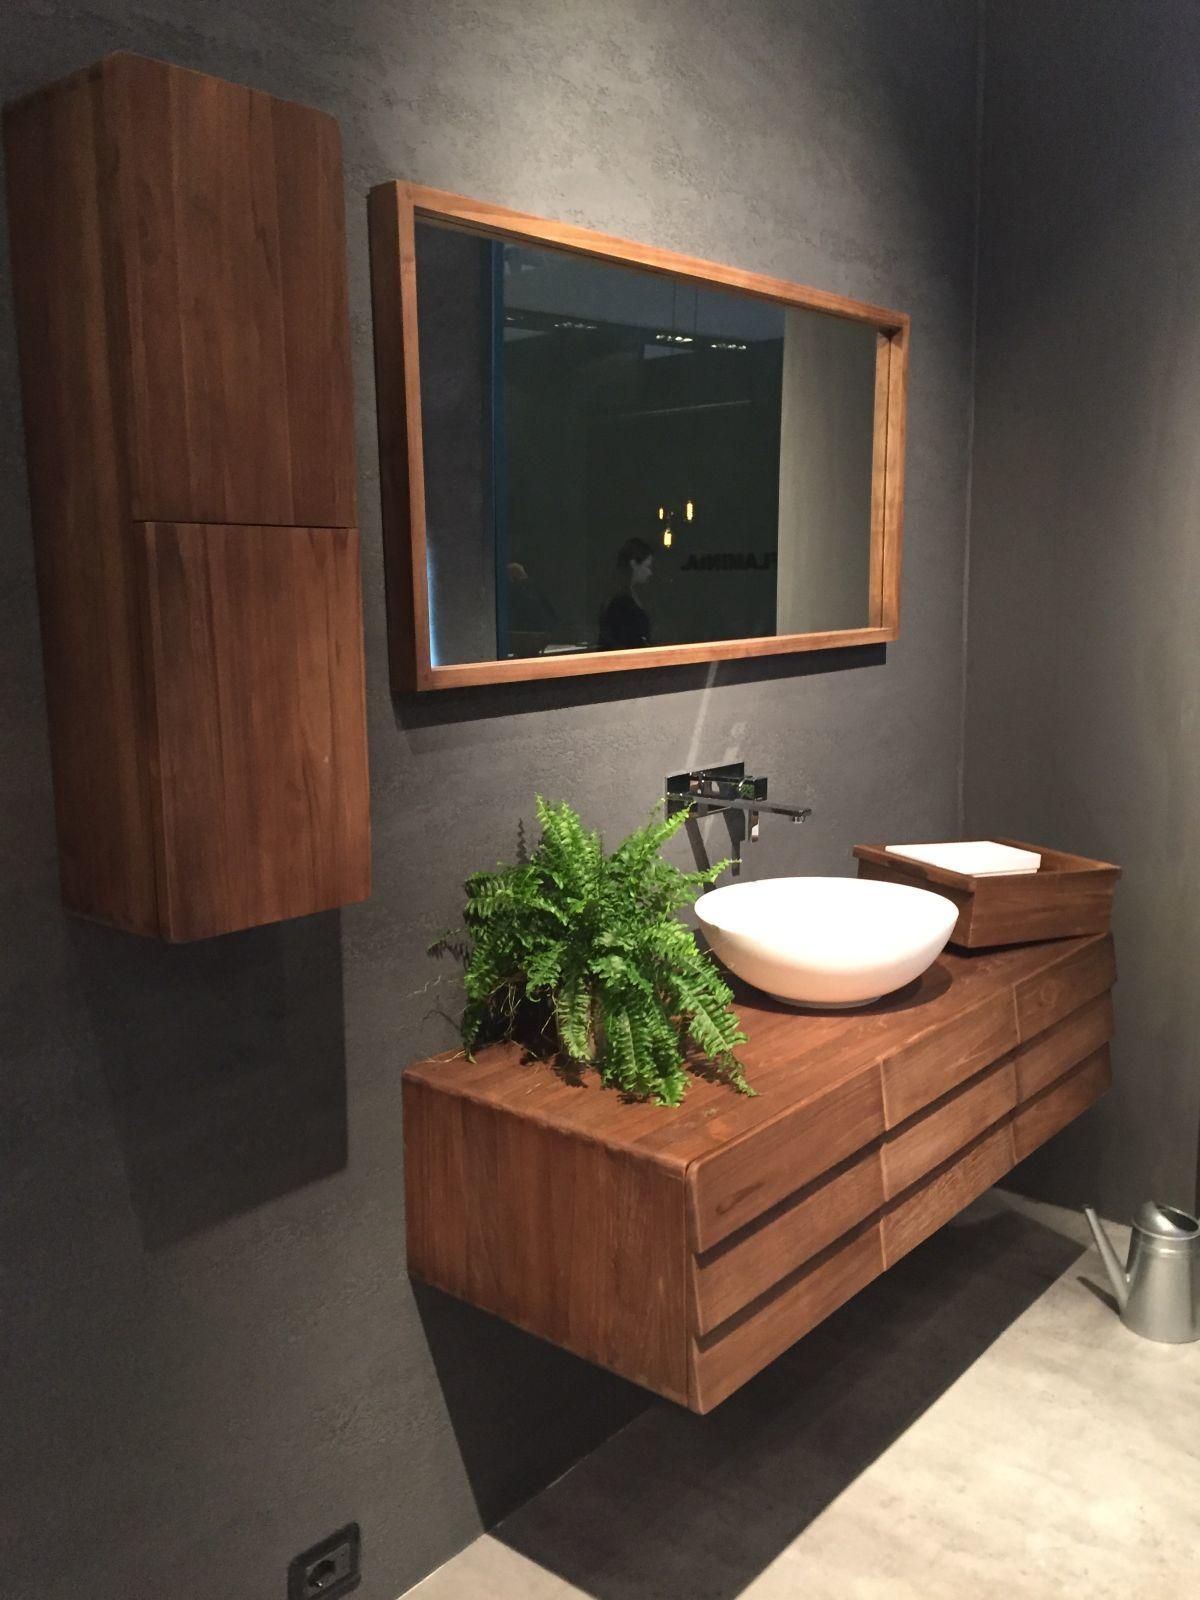 modern mid century modern bathroom vanity design-Unique Mid Century Modern Bathroom Vanity Wallpaper